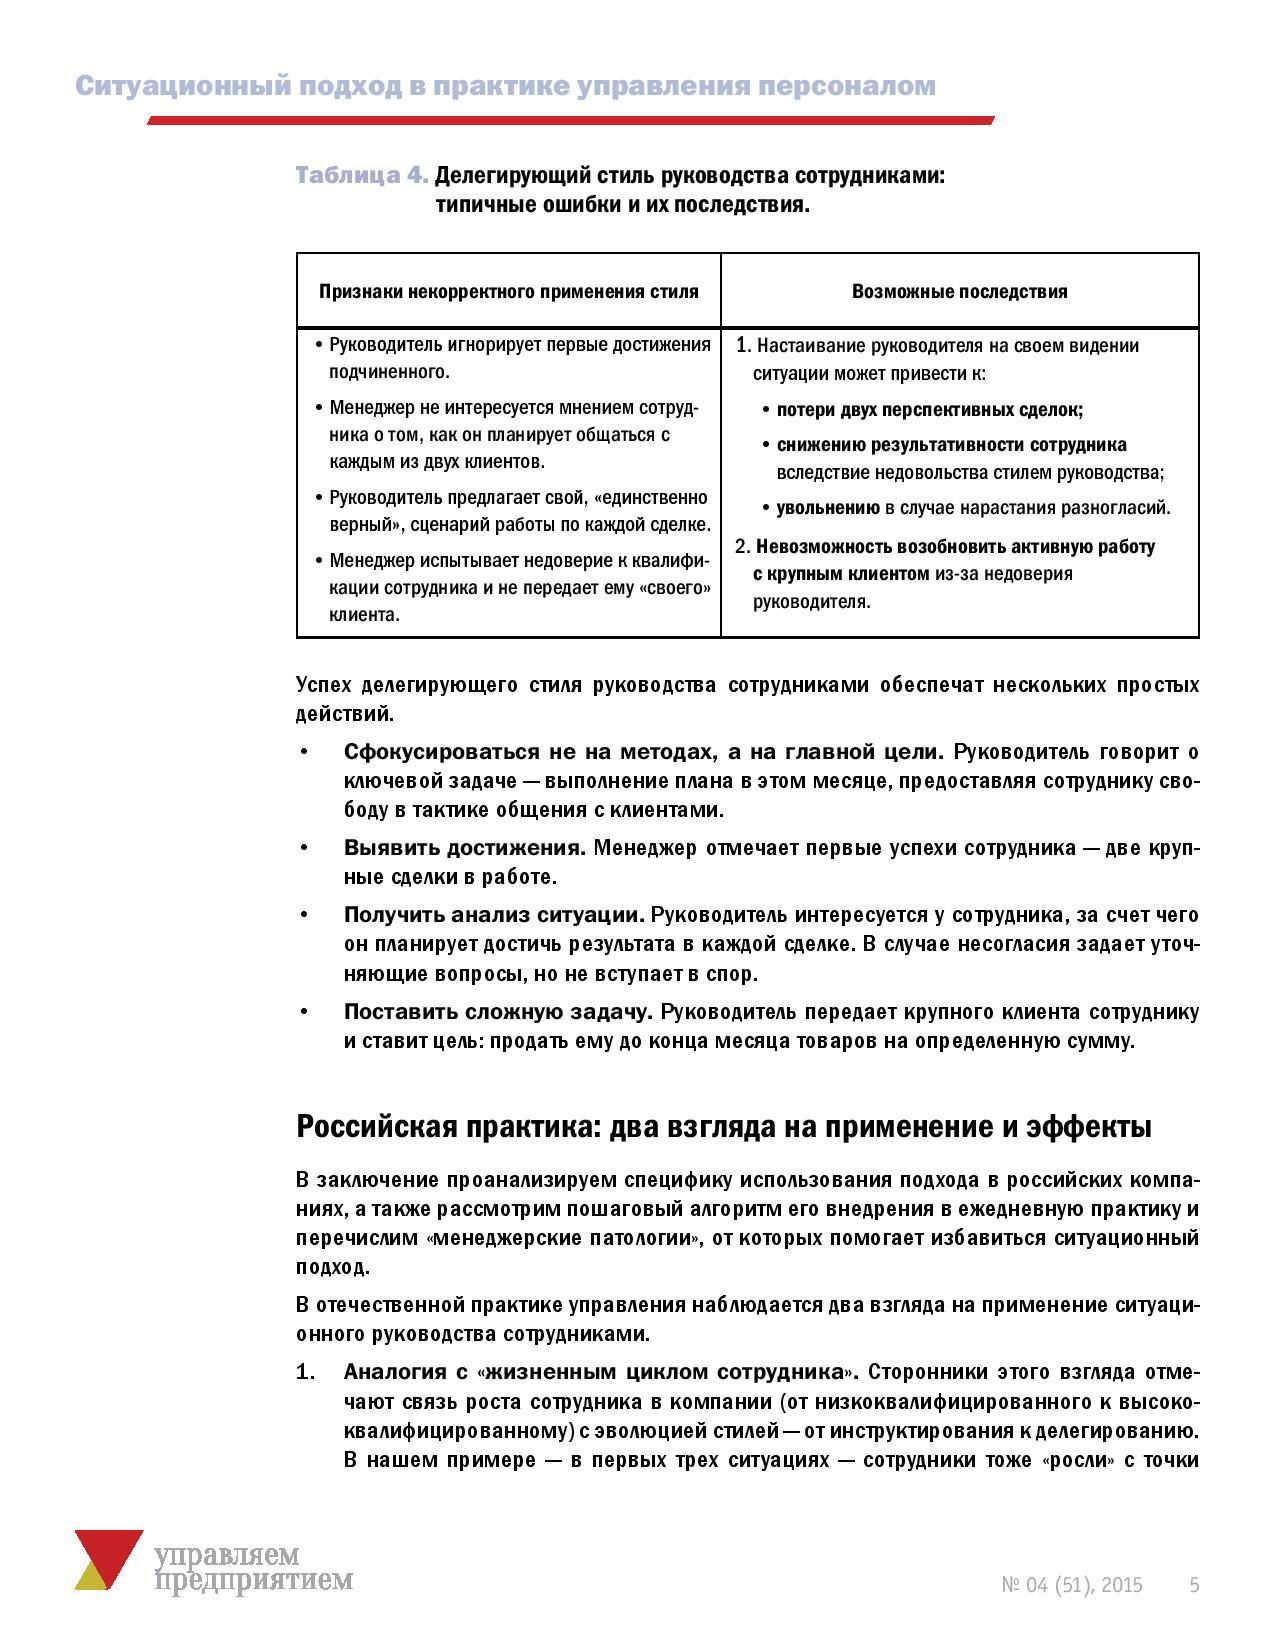 Situacionnyy_podhod_Cast__2._Upravlaem_predpriatiem__04_2015-page-005